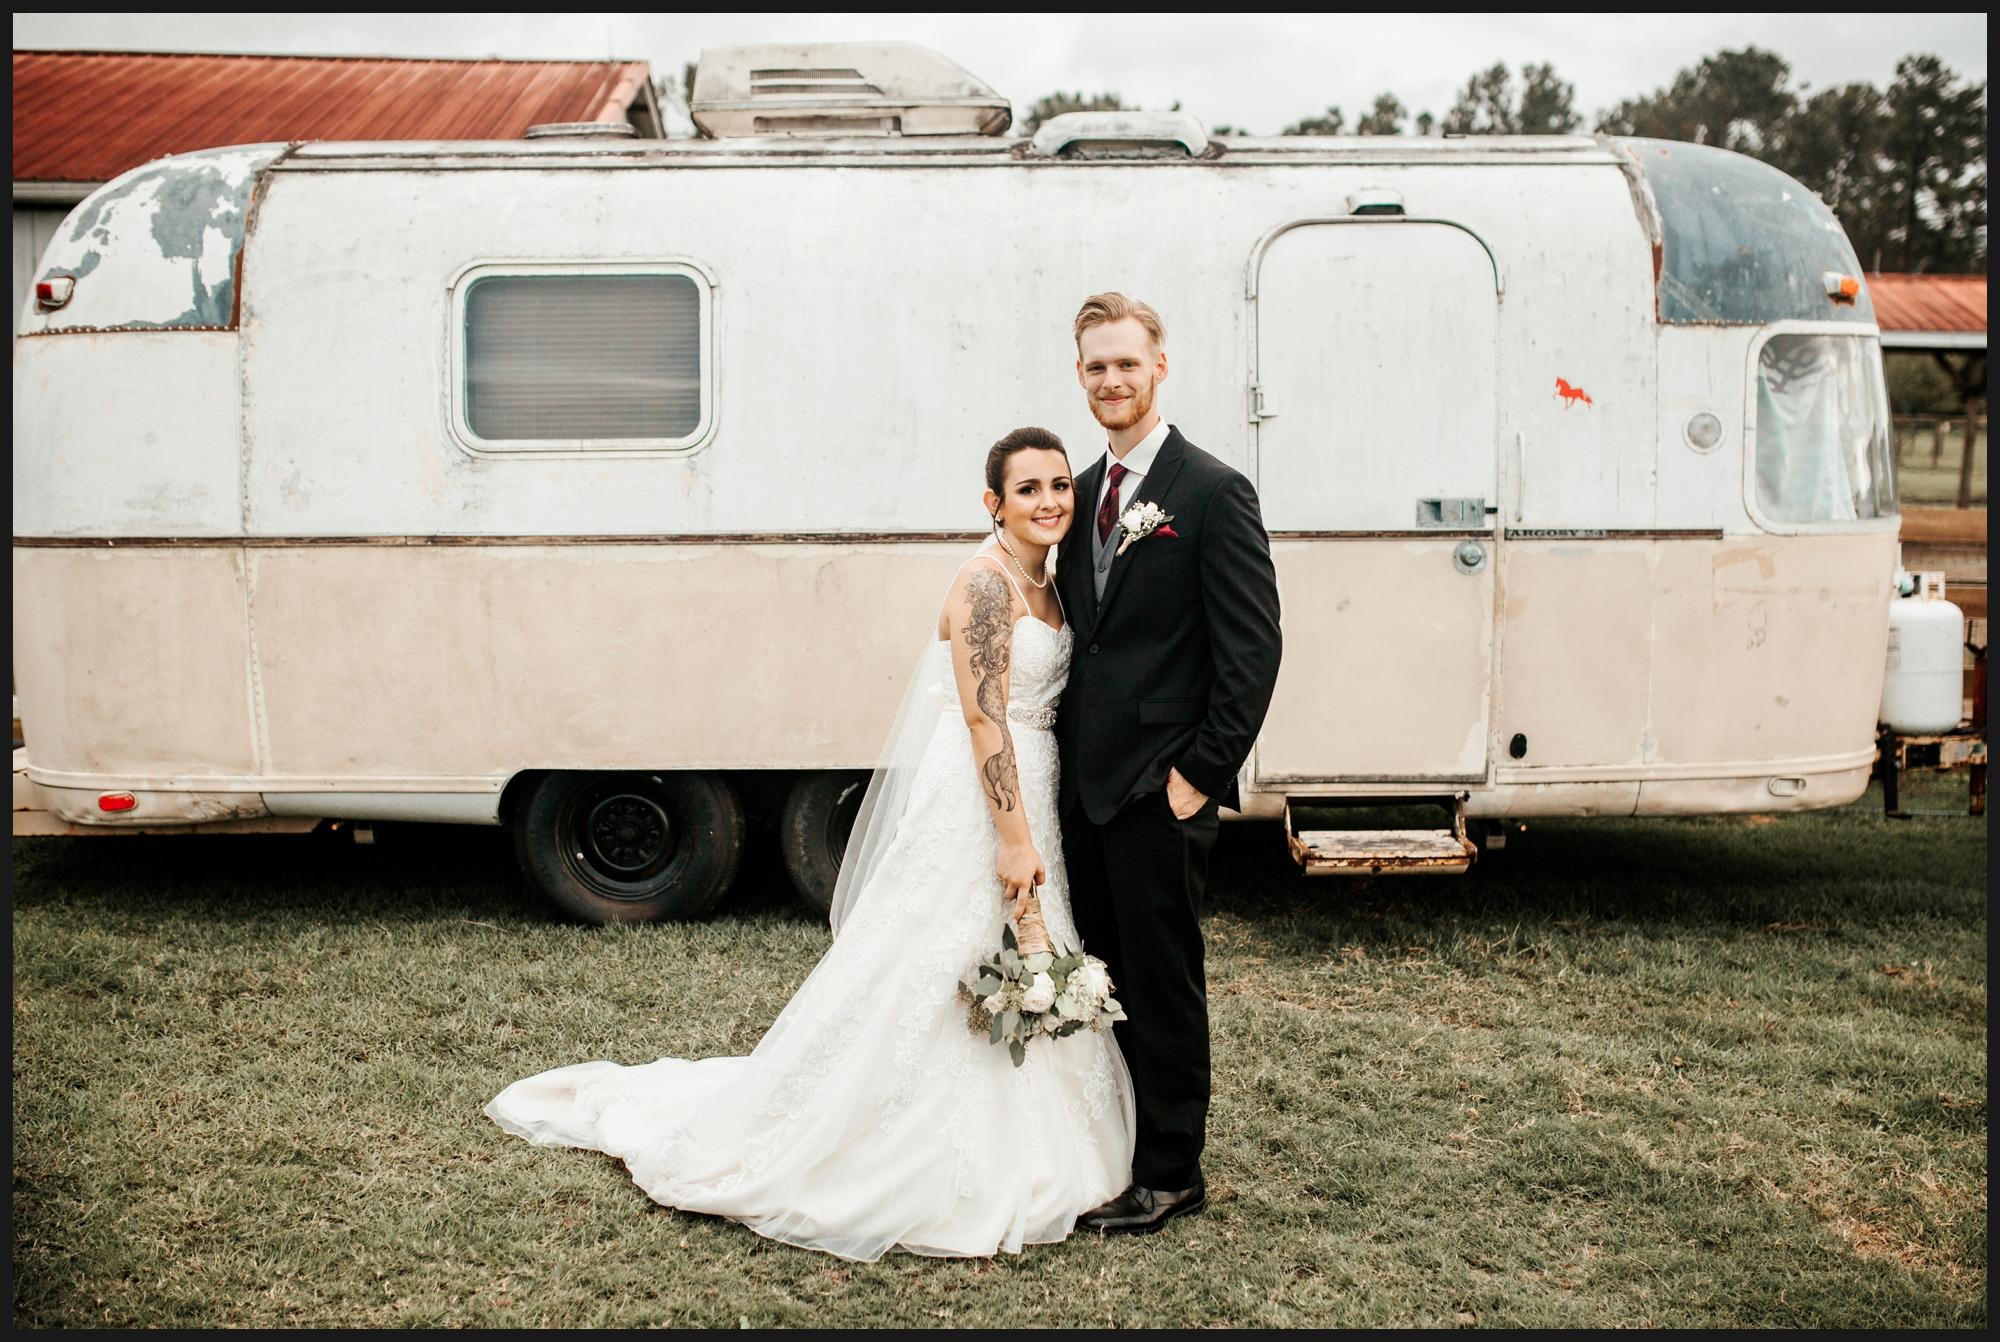 Orlando-Wedding-Photographer-destination-wedding-photographer-florida-wedding-photographer-bohemian-wedding-photographer_0362.jpg